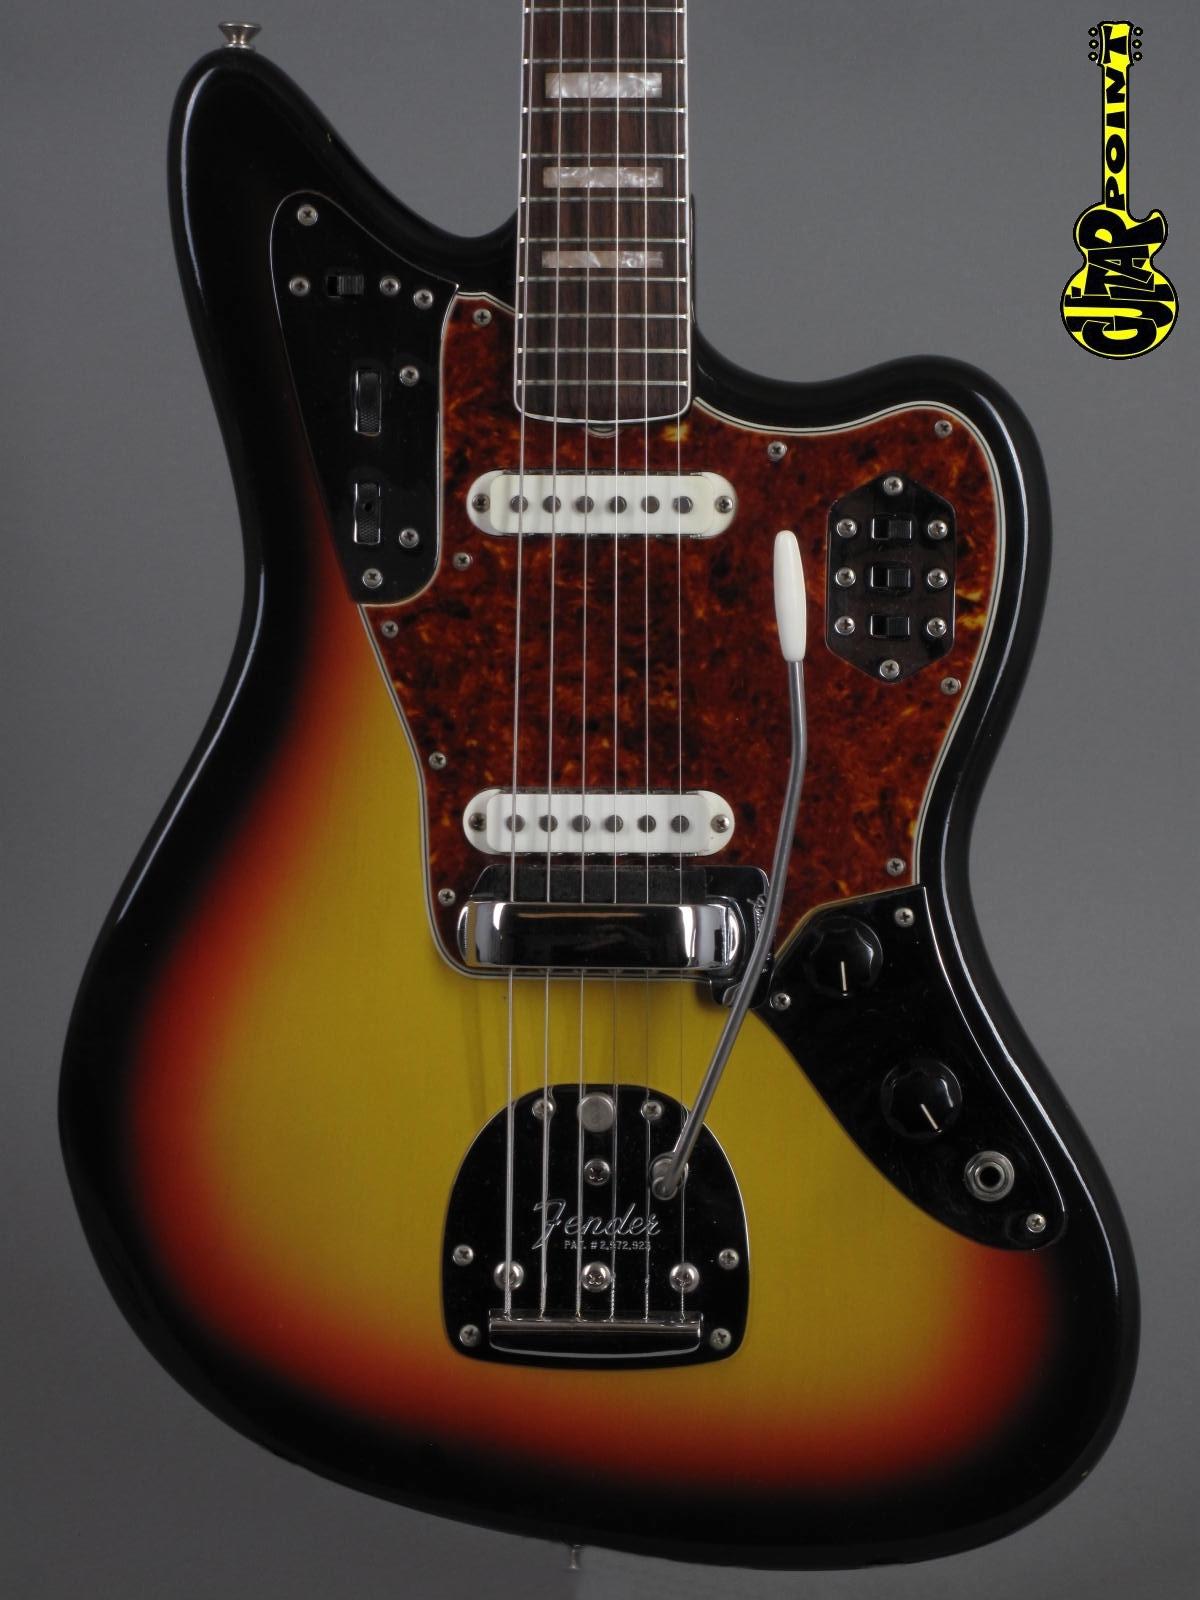 1966 Fender Jaguar in 3-tone Sunburst ...Mint & Case Candy !